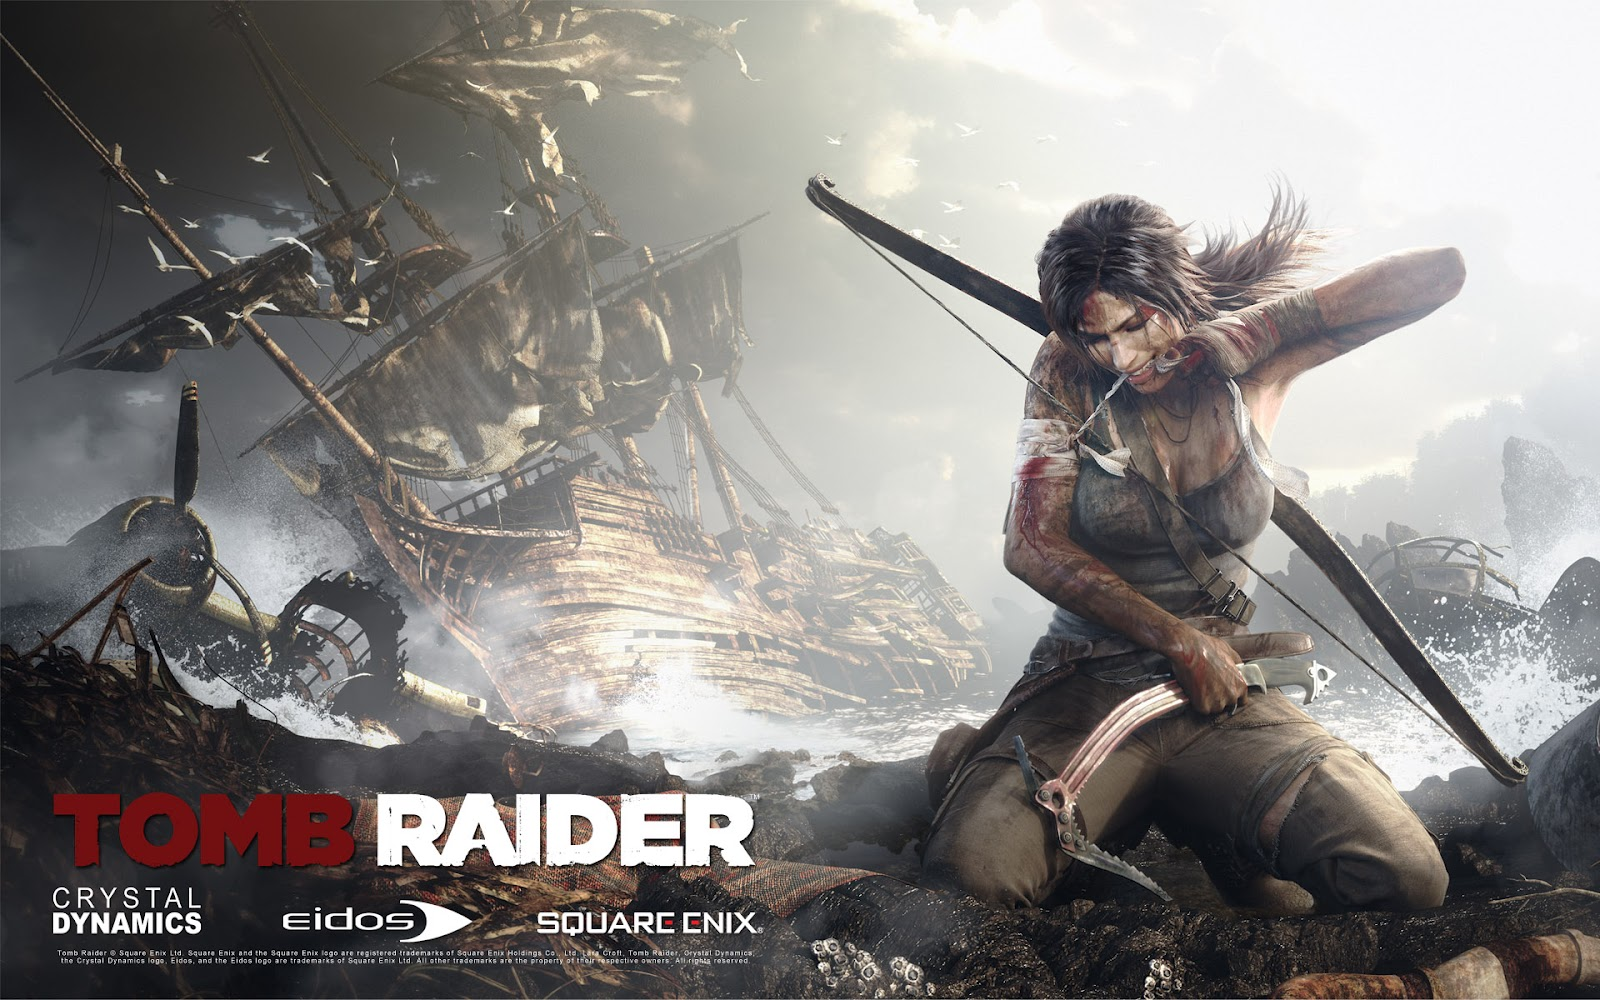 http://2.bp.blogspot.com/-RFGwy31xsHs/T5mbghB3maI/AAAAAAAABC0/c9m_lfIOd84/s1600/2012_tomb_raider_game-wide%5B1%5D.jpg